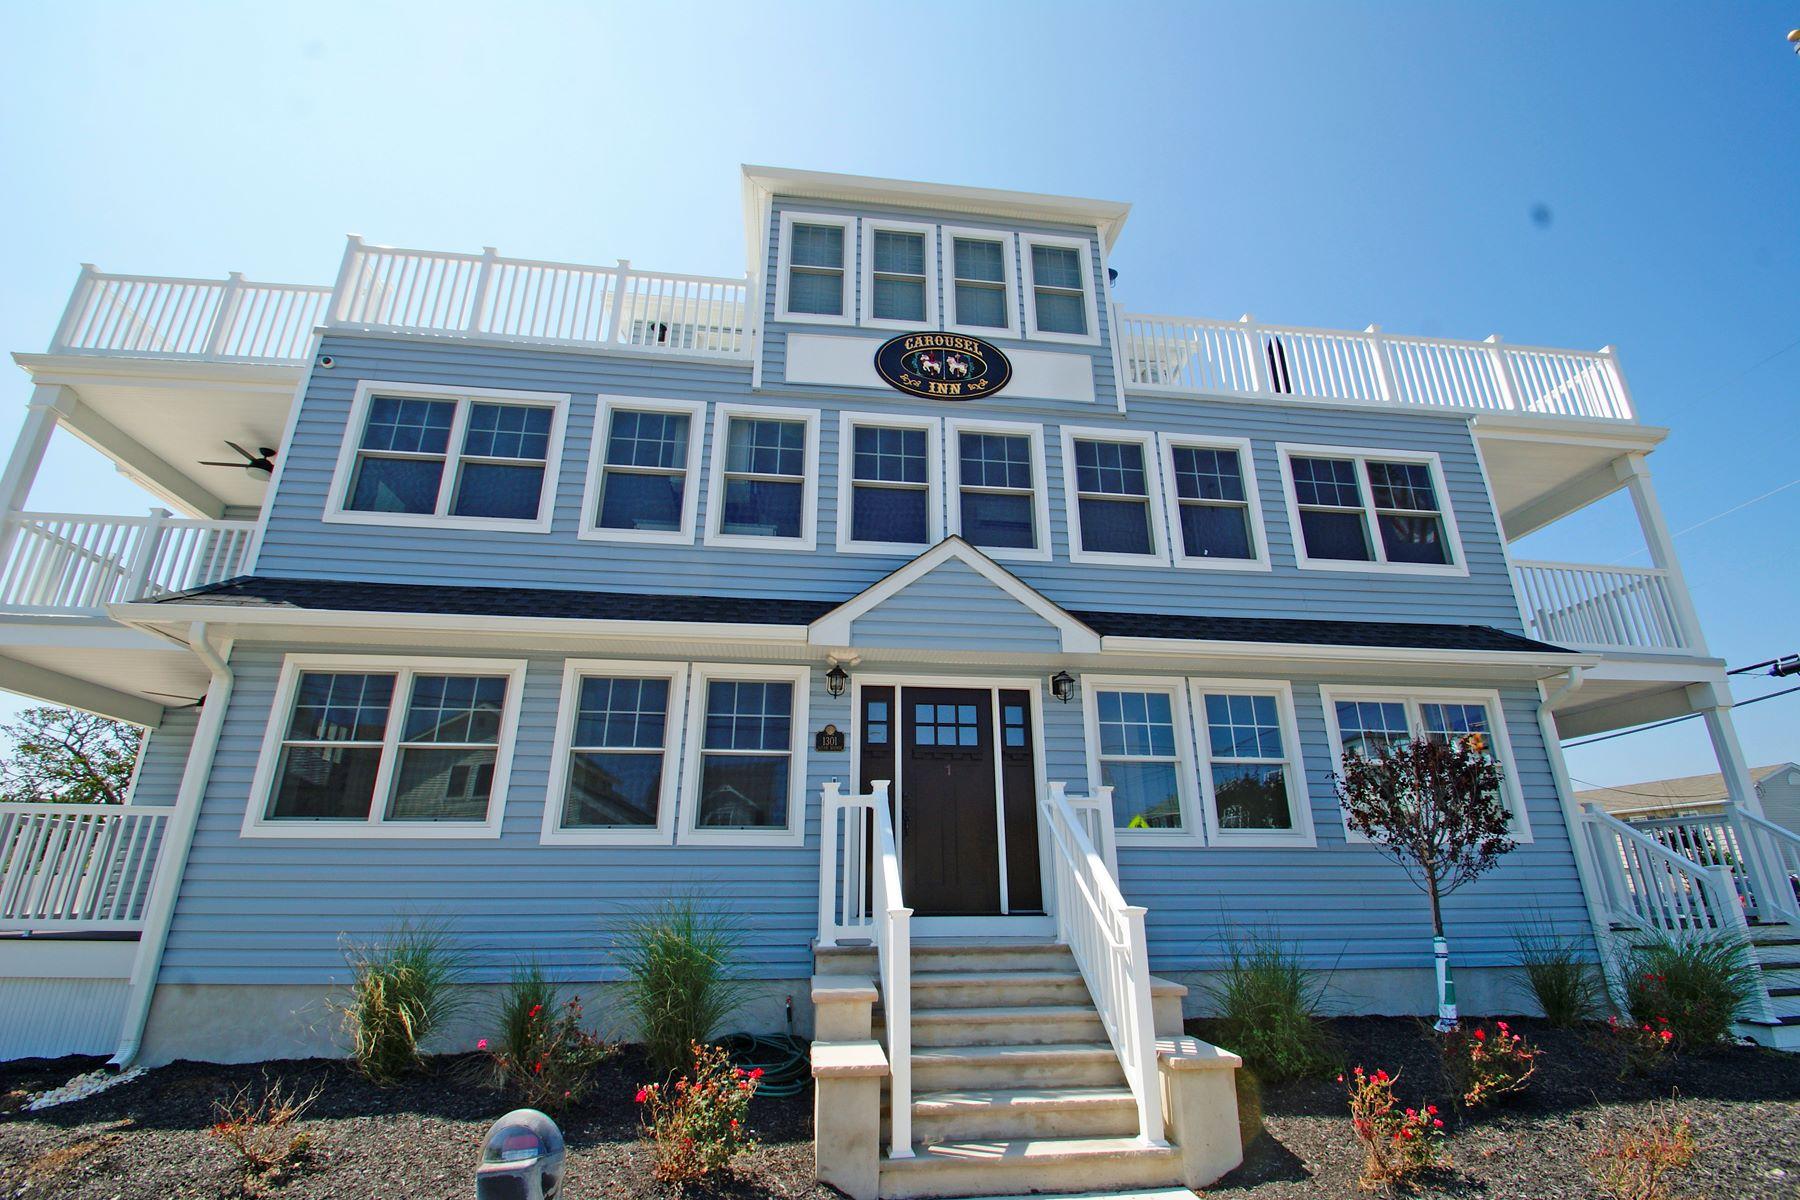 Condominiums для того Продажа на Beautifully Renovated Condo Close To The Beach 1301 Ocean Avenue #4, Point Pleasant Beach, Нью-Джерси 08742 Соединенные Штаты